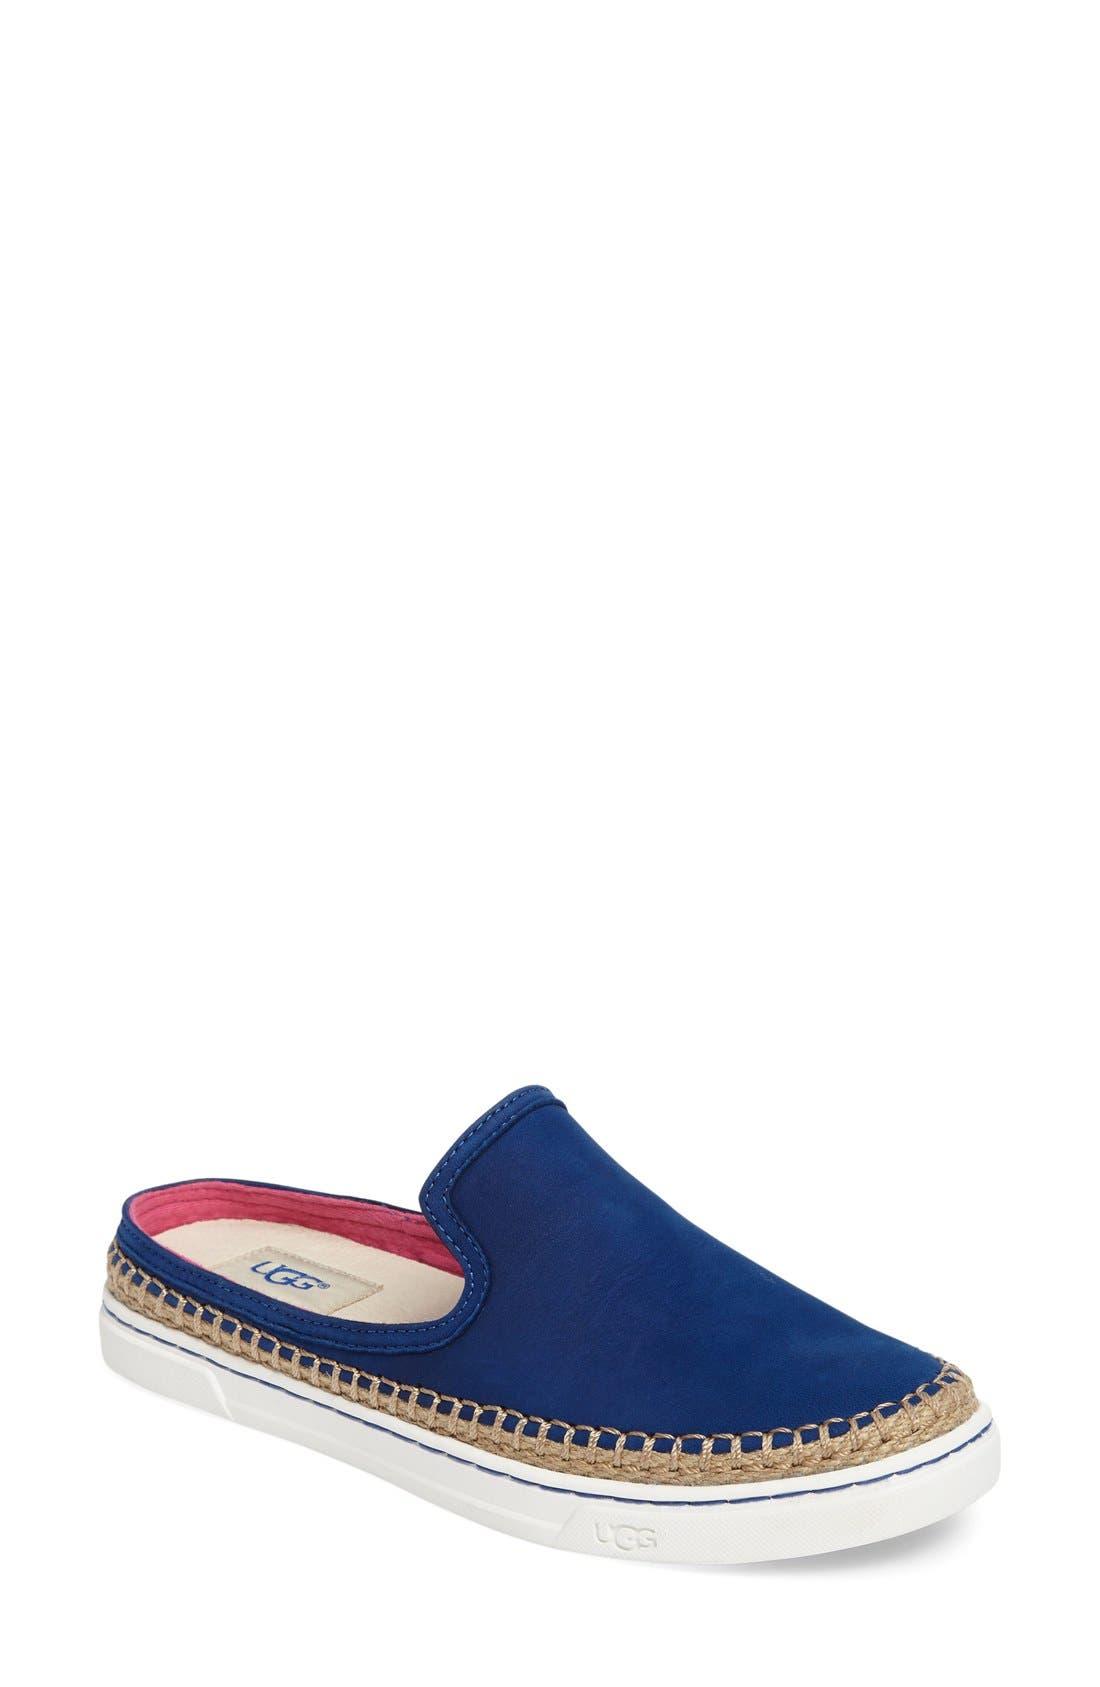 Alternate Image 1 Selected - UGG® 'Caleel' Slip-On Sneaker (Women)